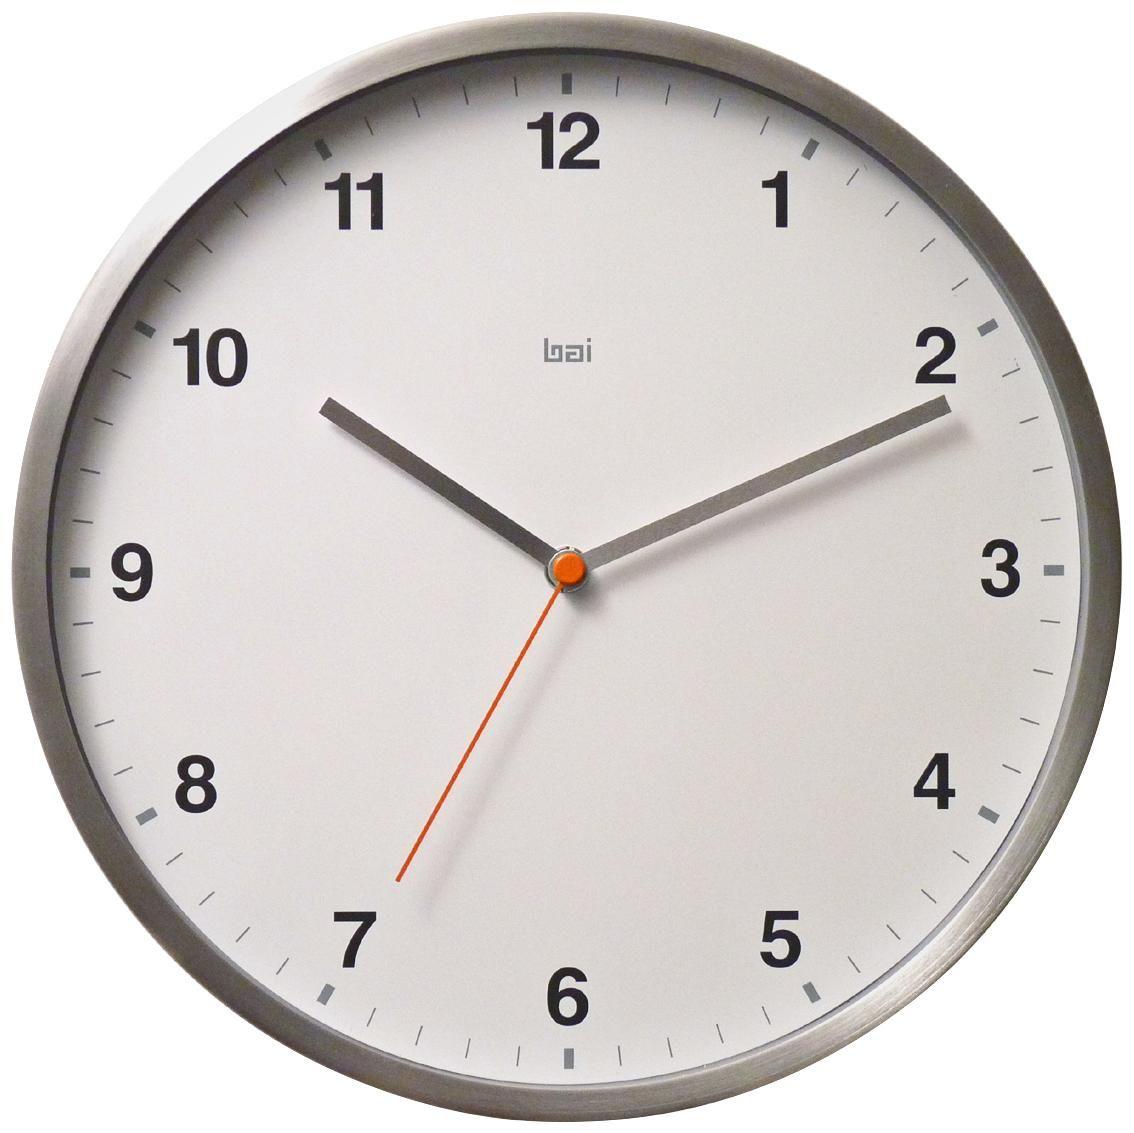 Helio Aluminum White 11 Round Wall Clock 7y778 Lamps Plus Round Wall Clocks Wall Clock Clock